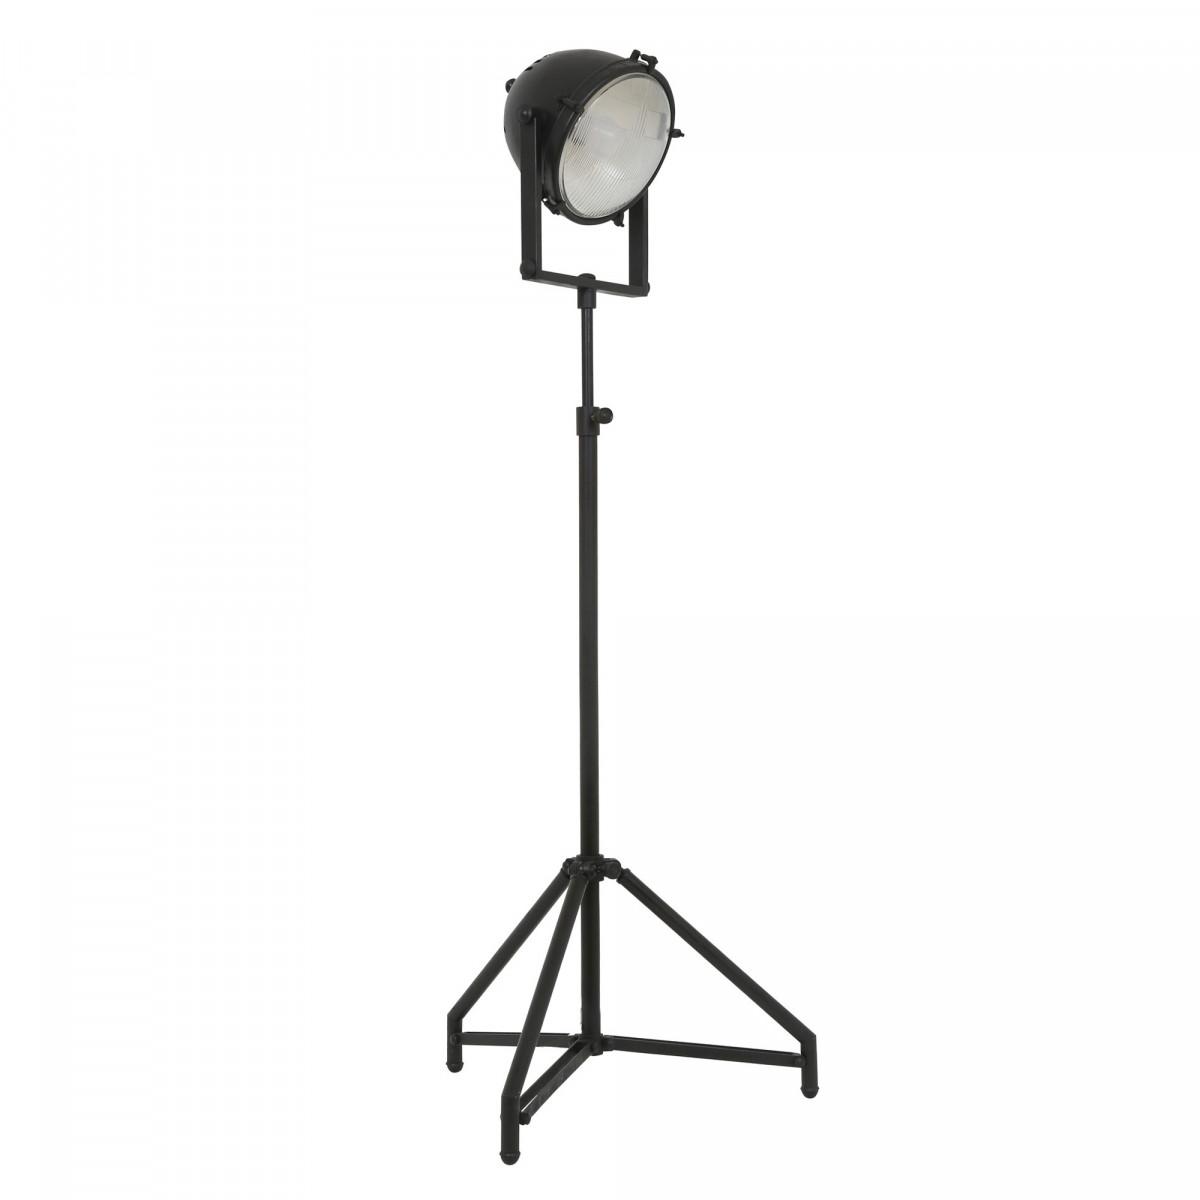 Retro Stehlampe Imola XXL Schwarz